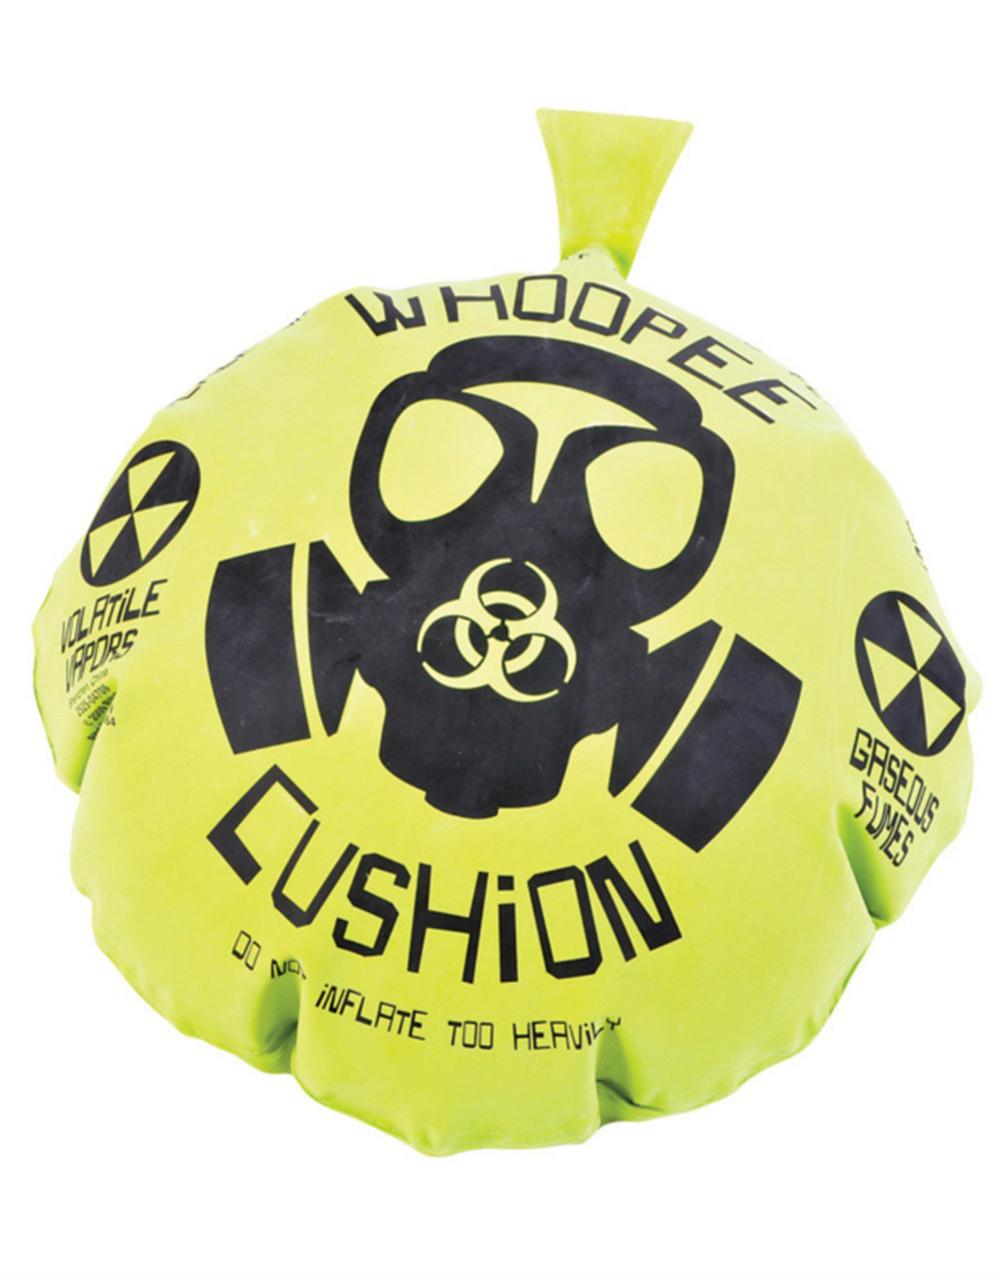 "17"" Giant Gas Mask Biohazard Green Yellow Rubber Whoopie Woopee Cushion Joke Toy by Rhode Island Novelty"